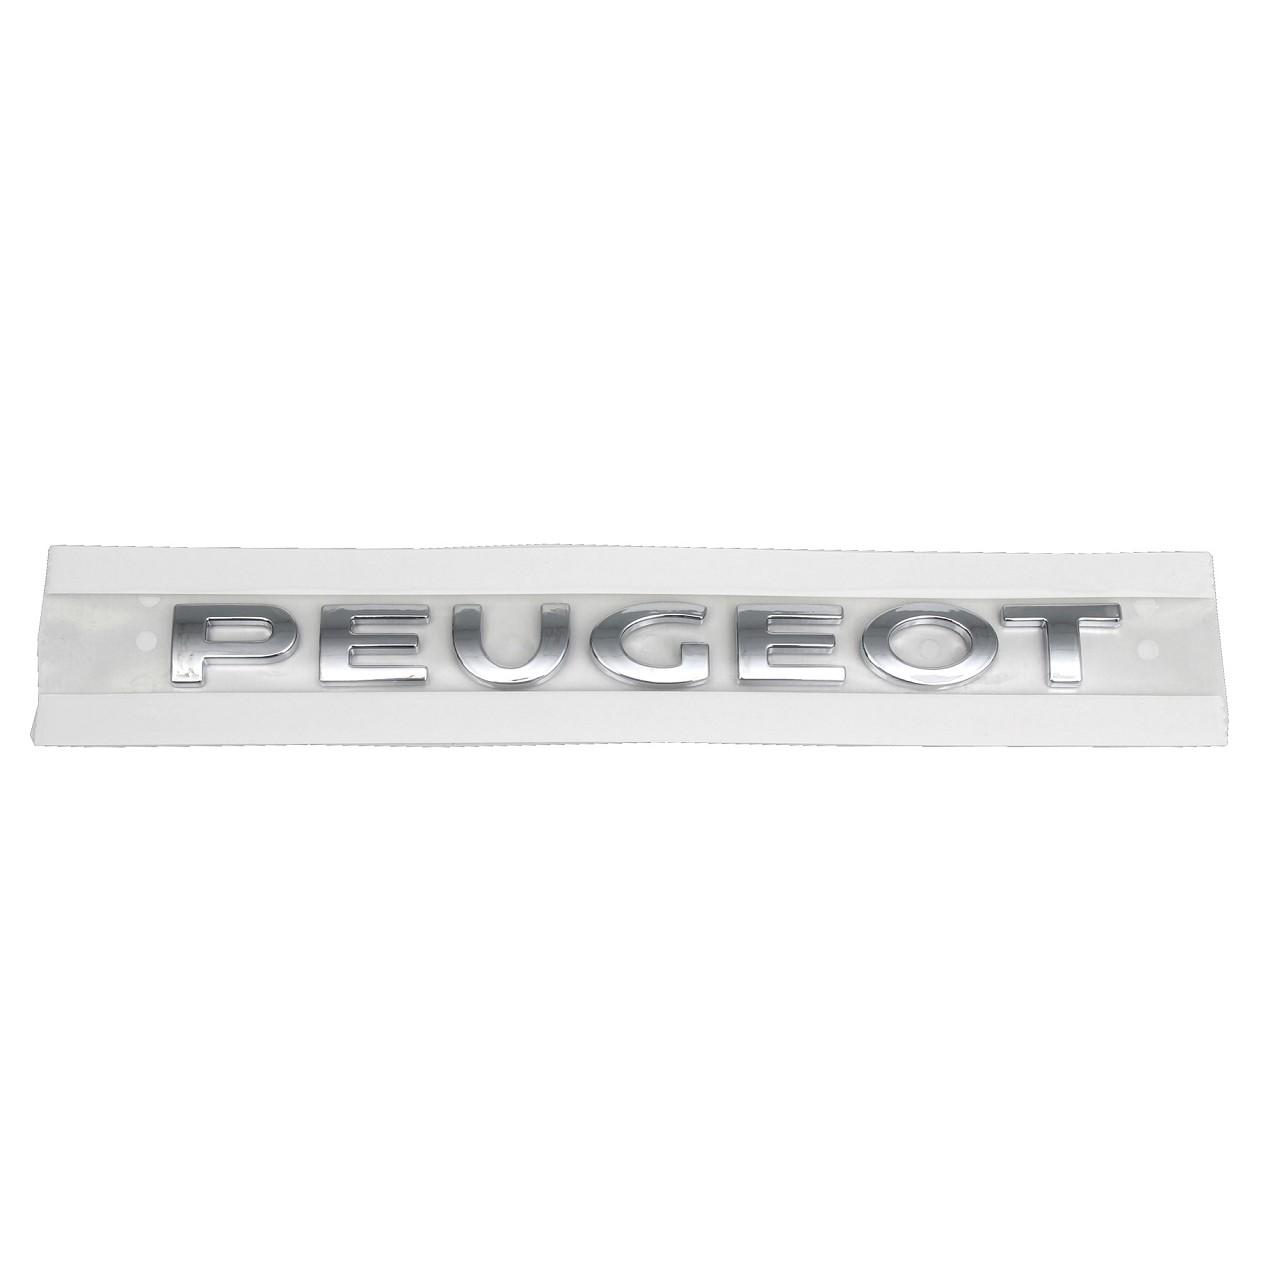 ORIGINAL Peugeot Emblem Logo Plakette CHROM 308 / 308 CC links 8665.VF